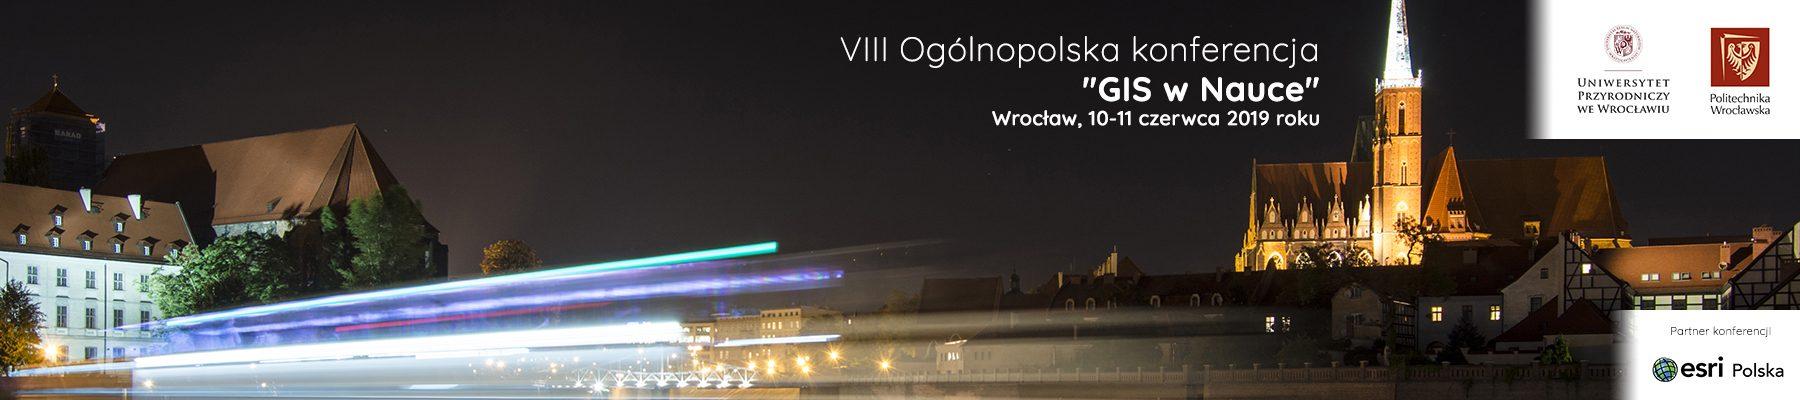 "VIII Ogólnopolska konferencja ""GIS w Nauce"""